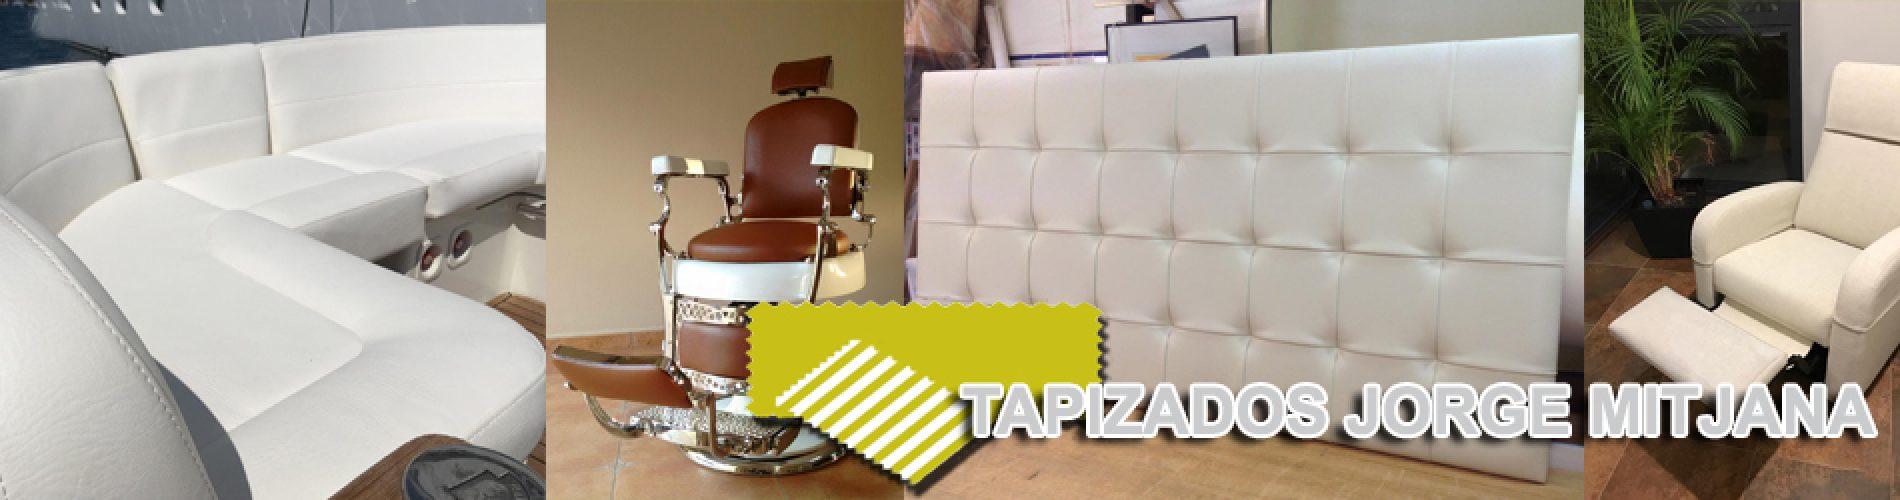 Tapiceros tapicerias en Valencia | Jorge Mitjana